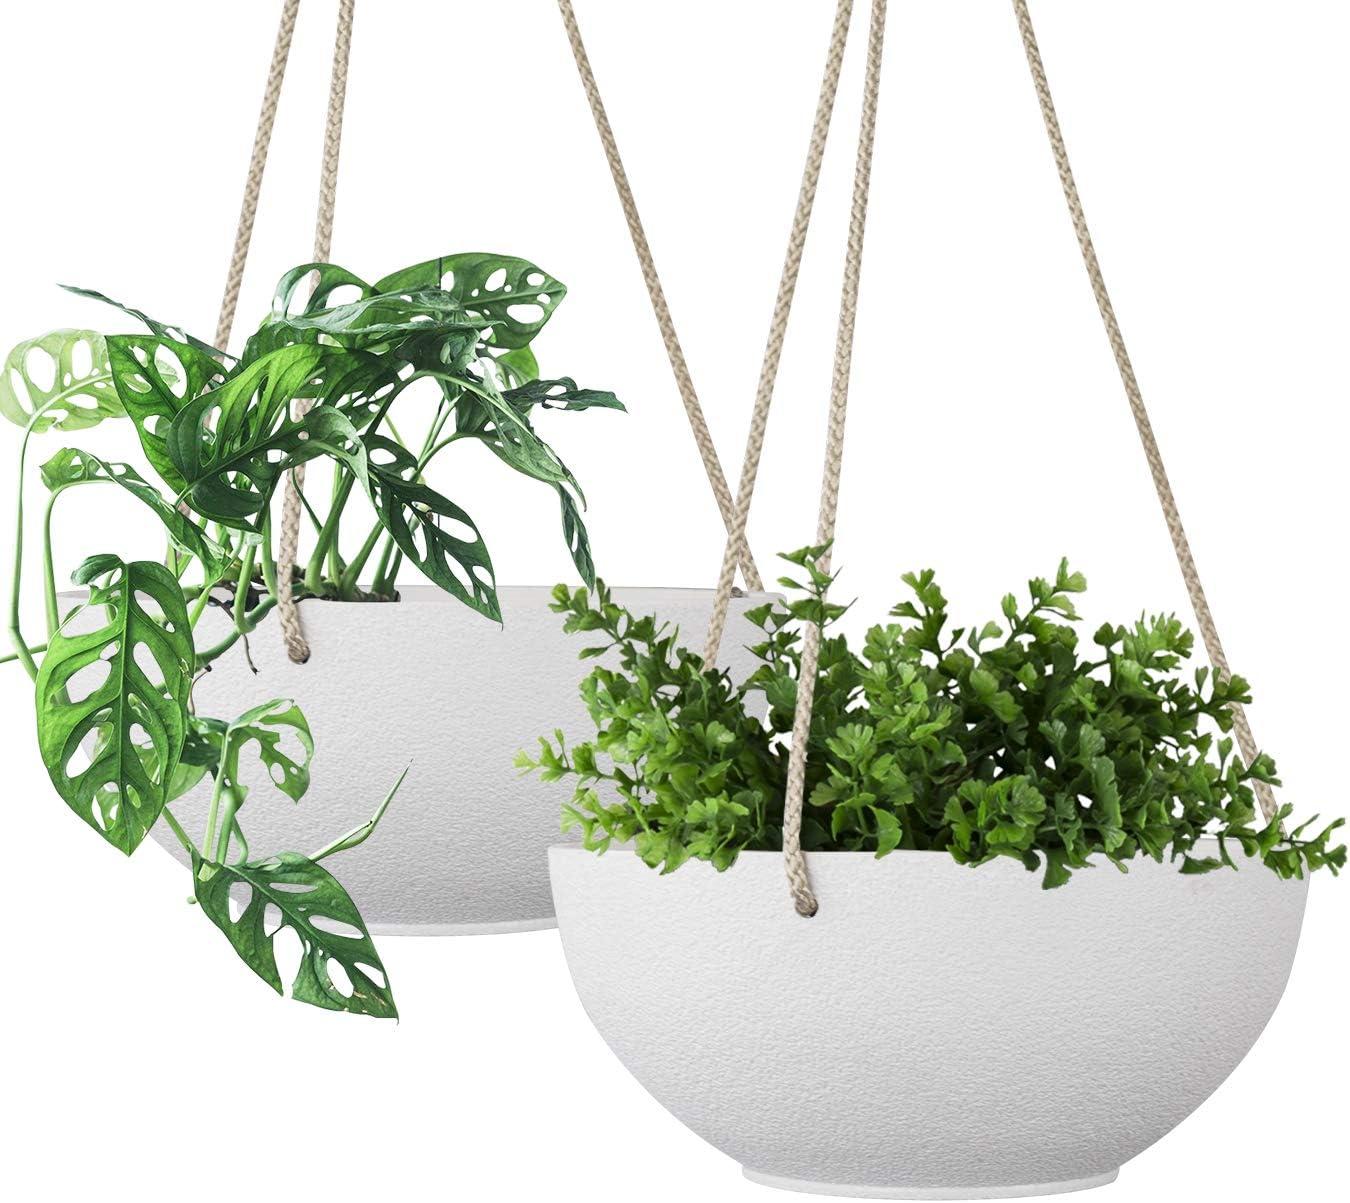 Hanging Planter Set Hanging Baskets Pots For Plants Flower Patio Indoor Decor